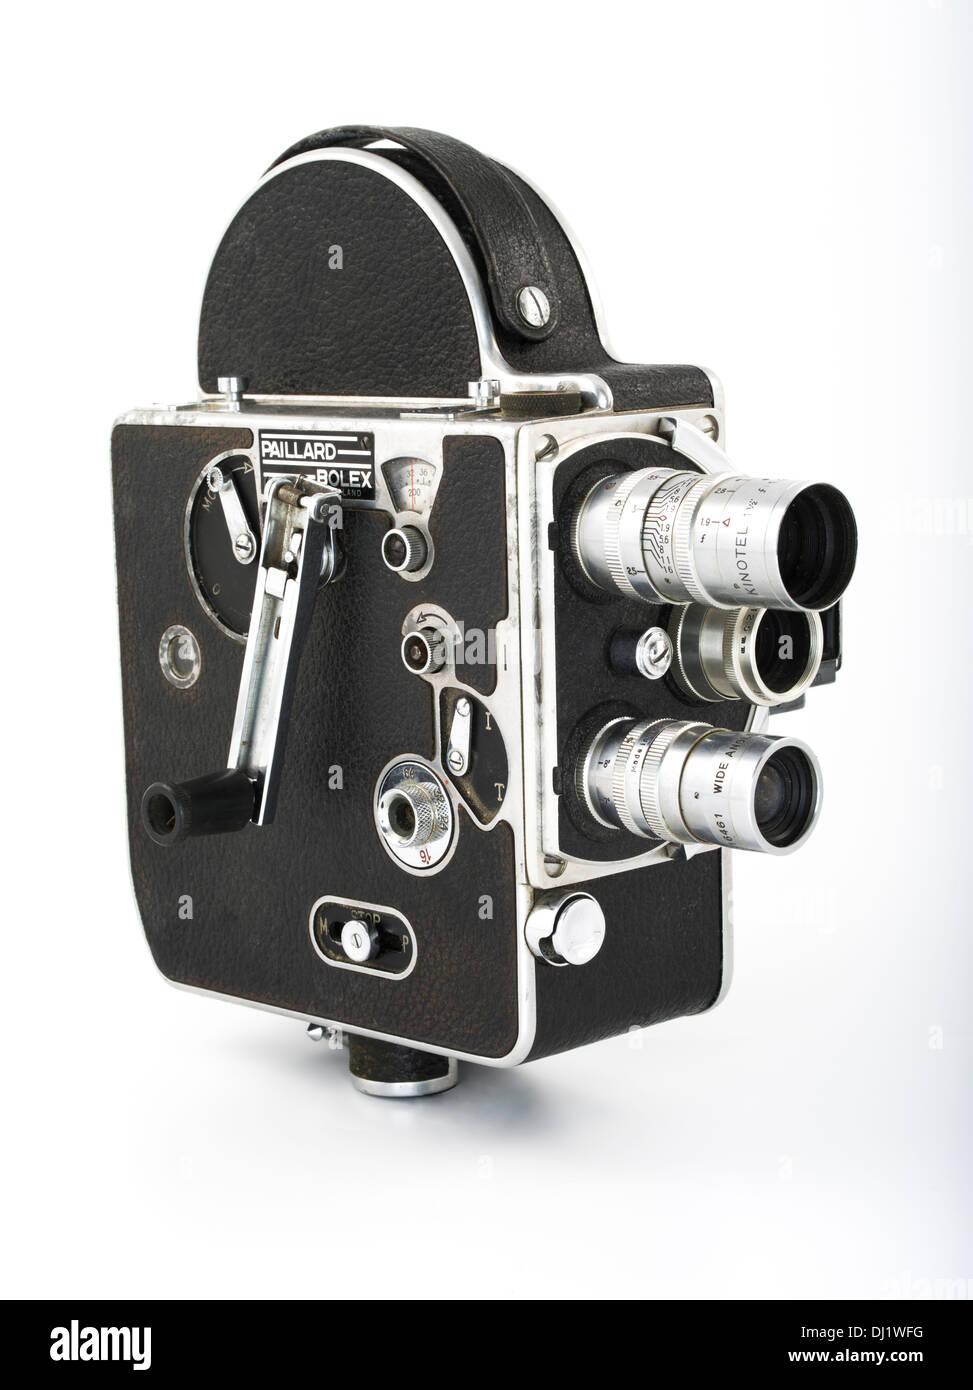 paillard bolex 8mm movie camera stock photo royalty free image 62736900 alamy. Black Bedroom Furniture Sets. Home Design Ideas